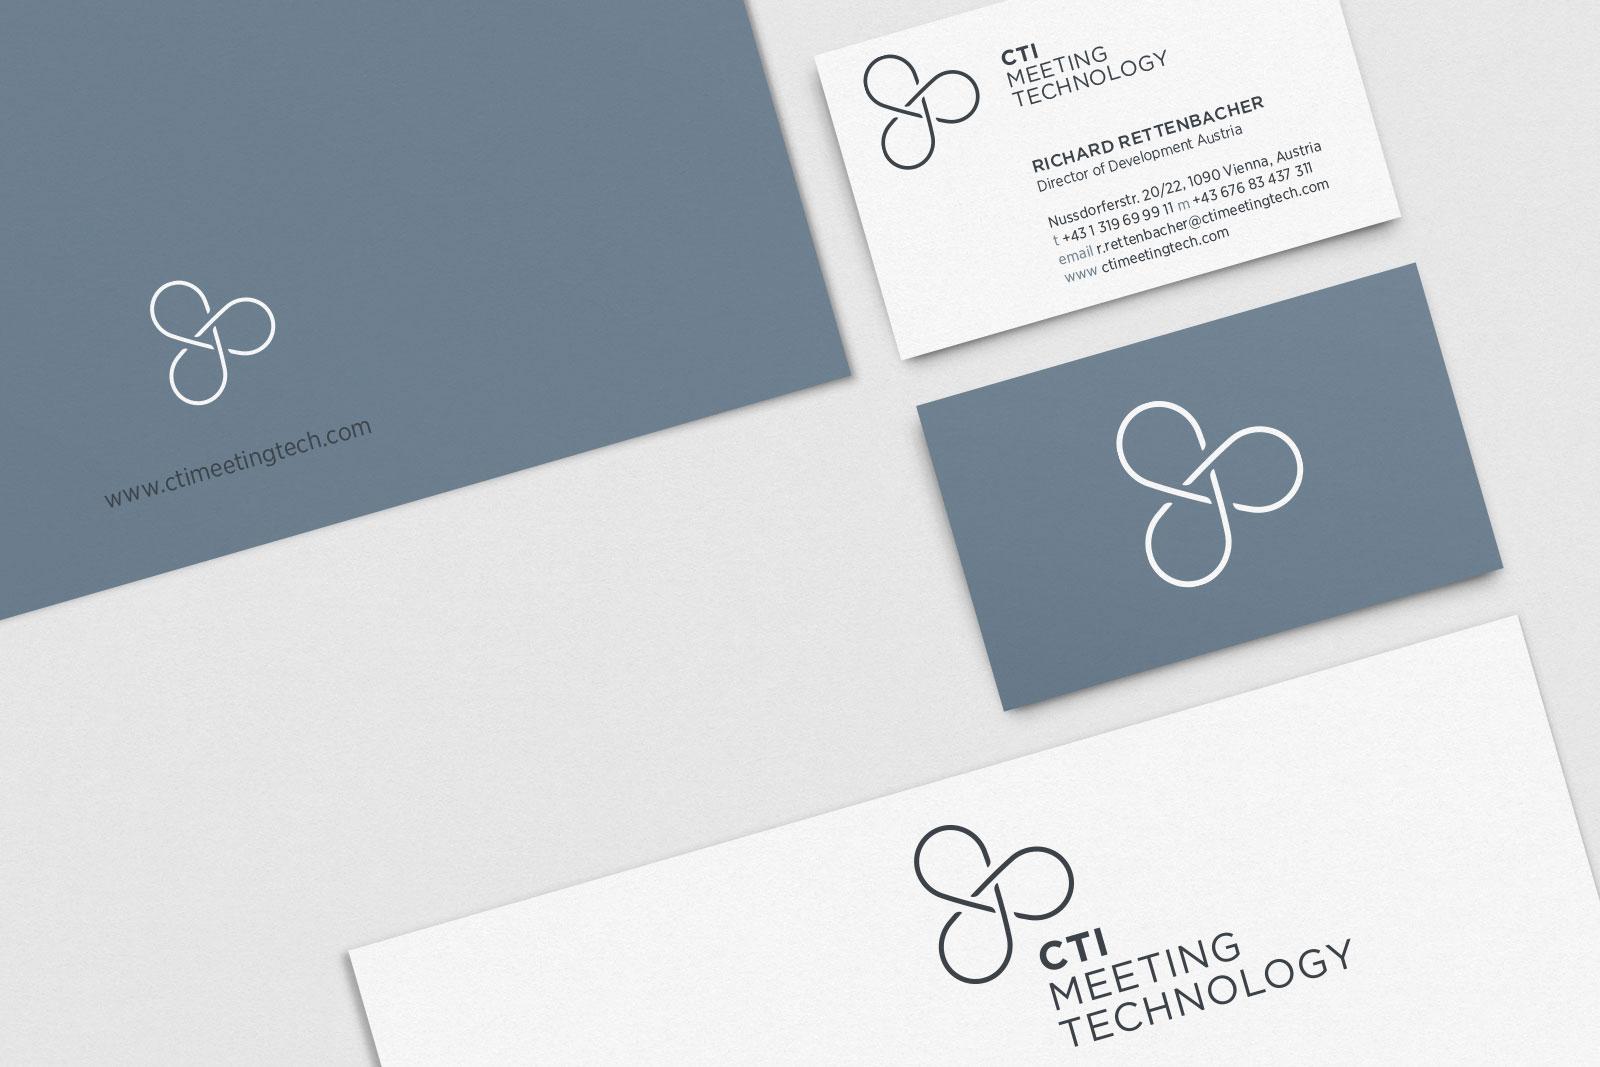 Cti Stationery 4